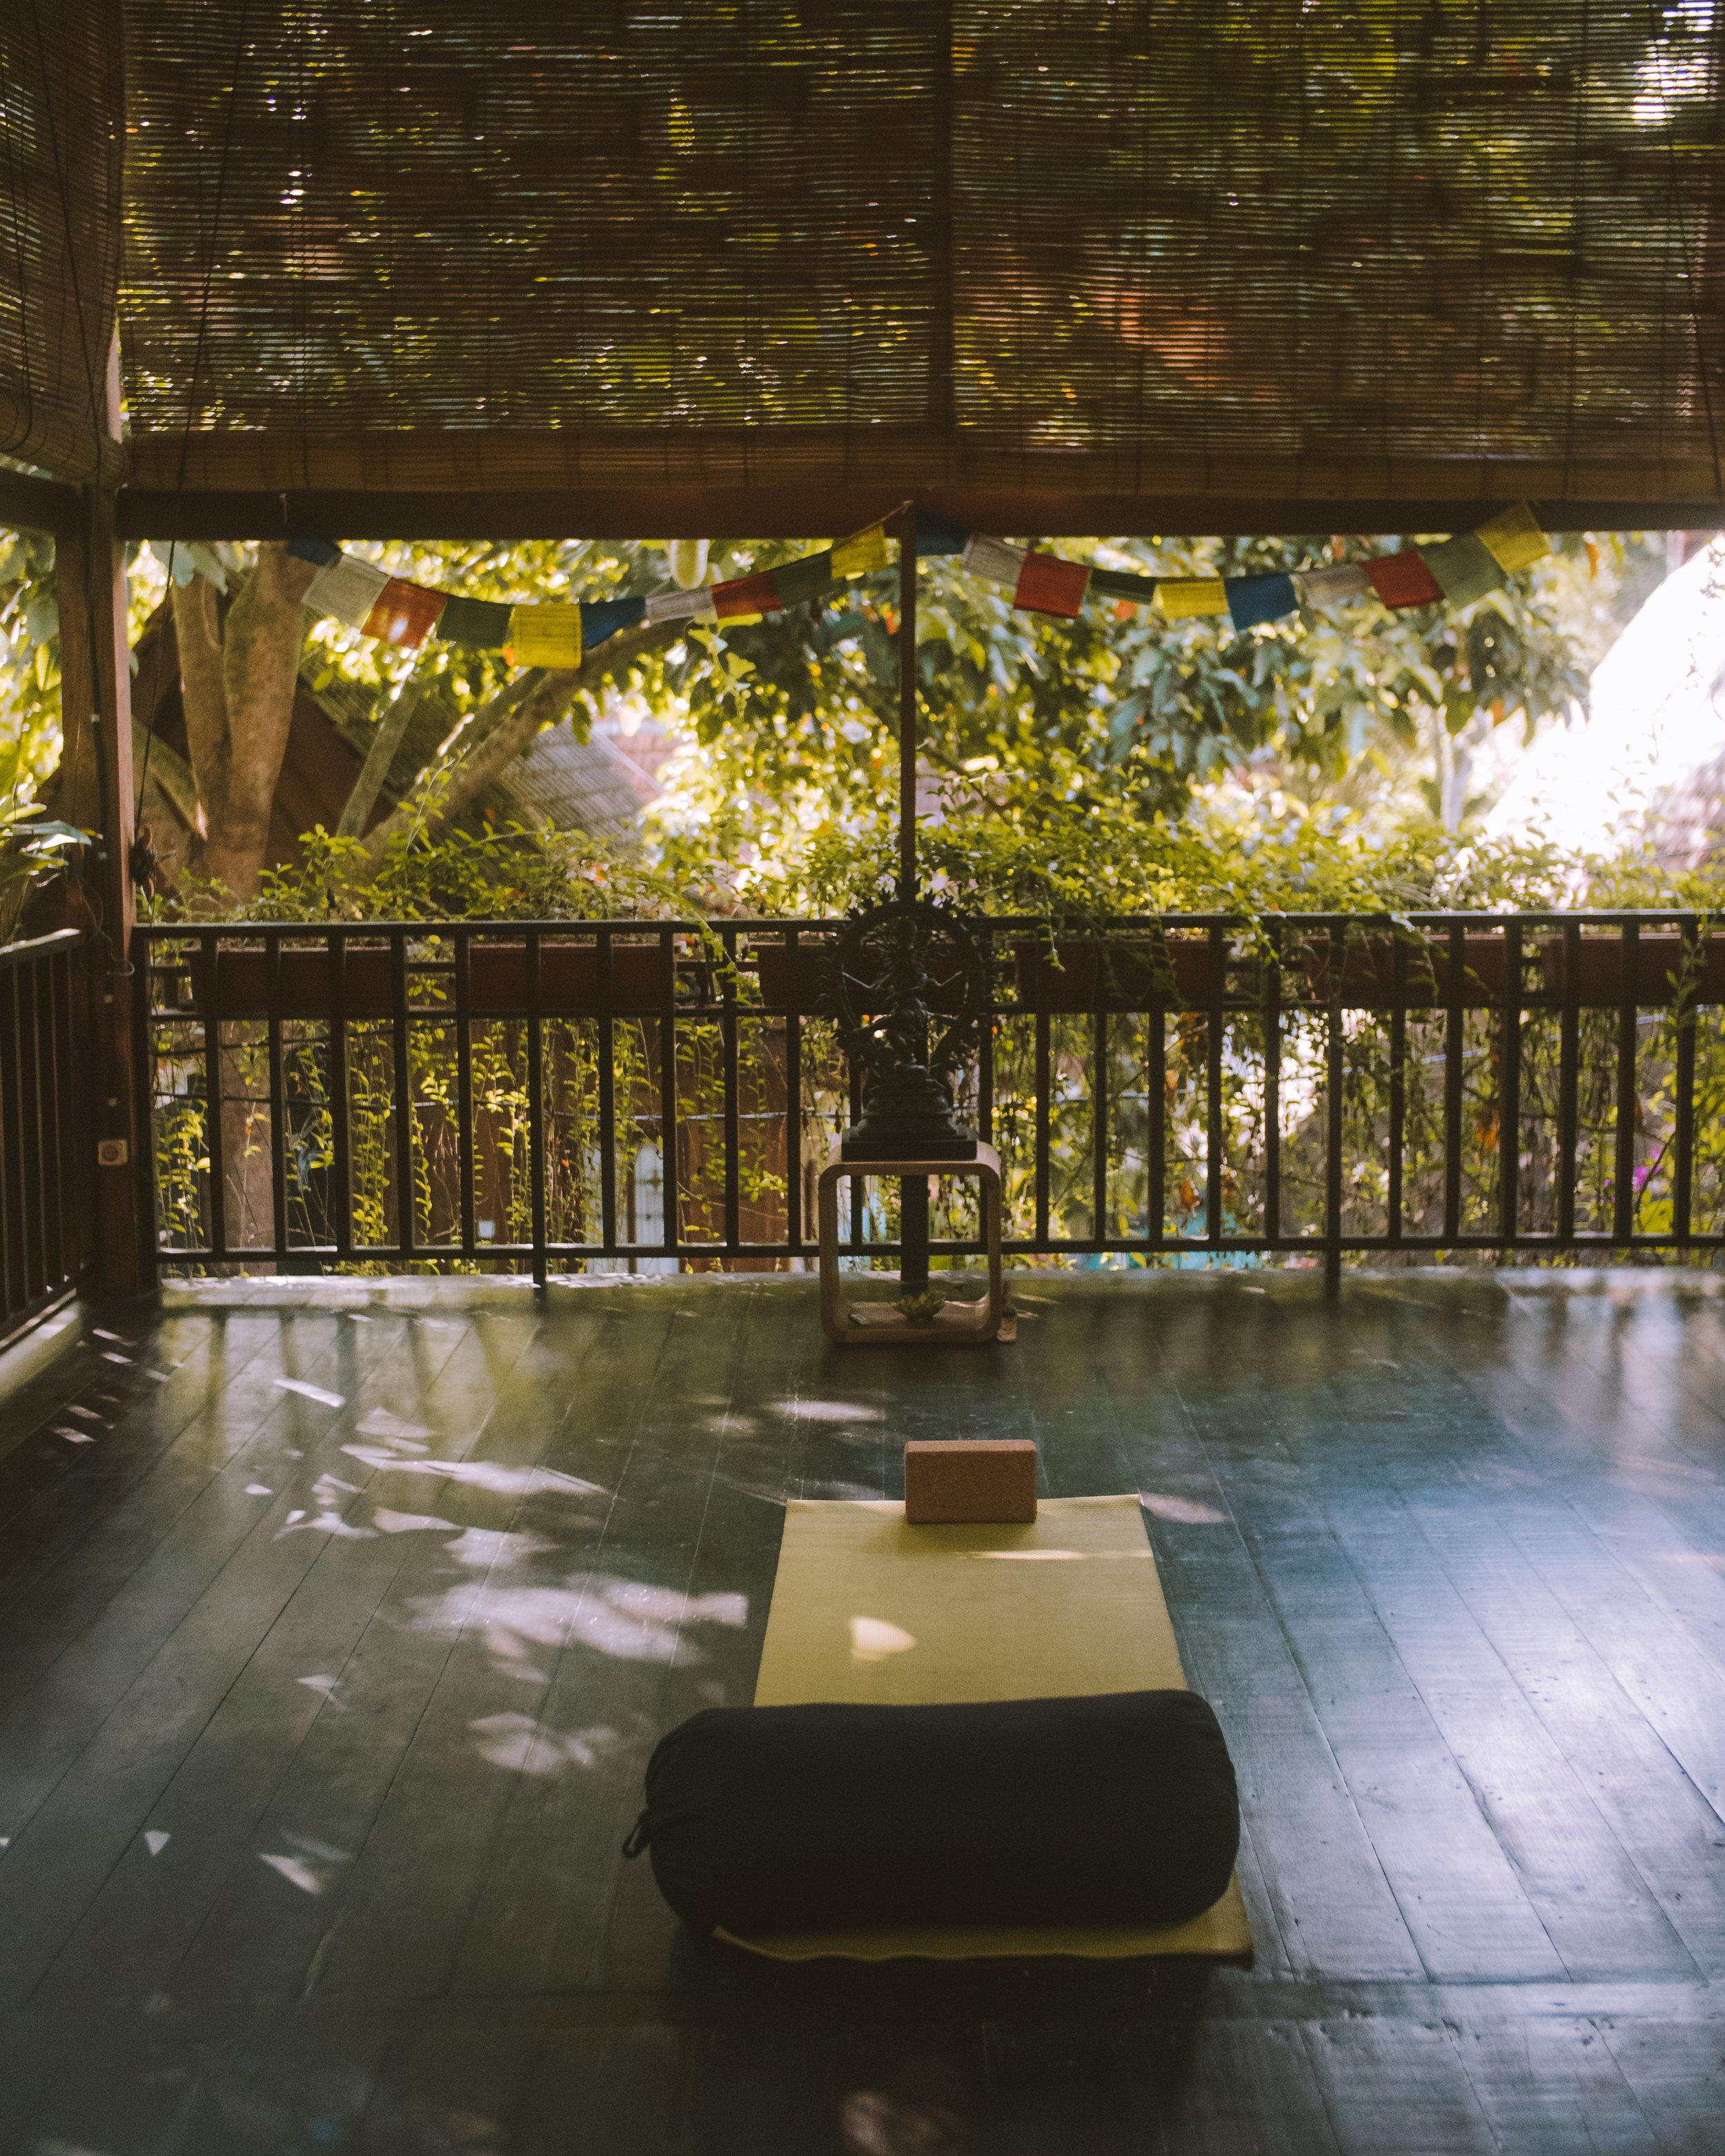 Vancouver-BC-Canada-Travel-Hospitality-Adventure-Commercial-Photographer-Indonesia-Bali-Lombok-Emma-Rae.jpg